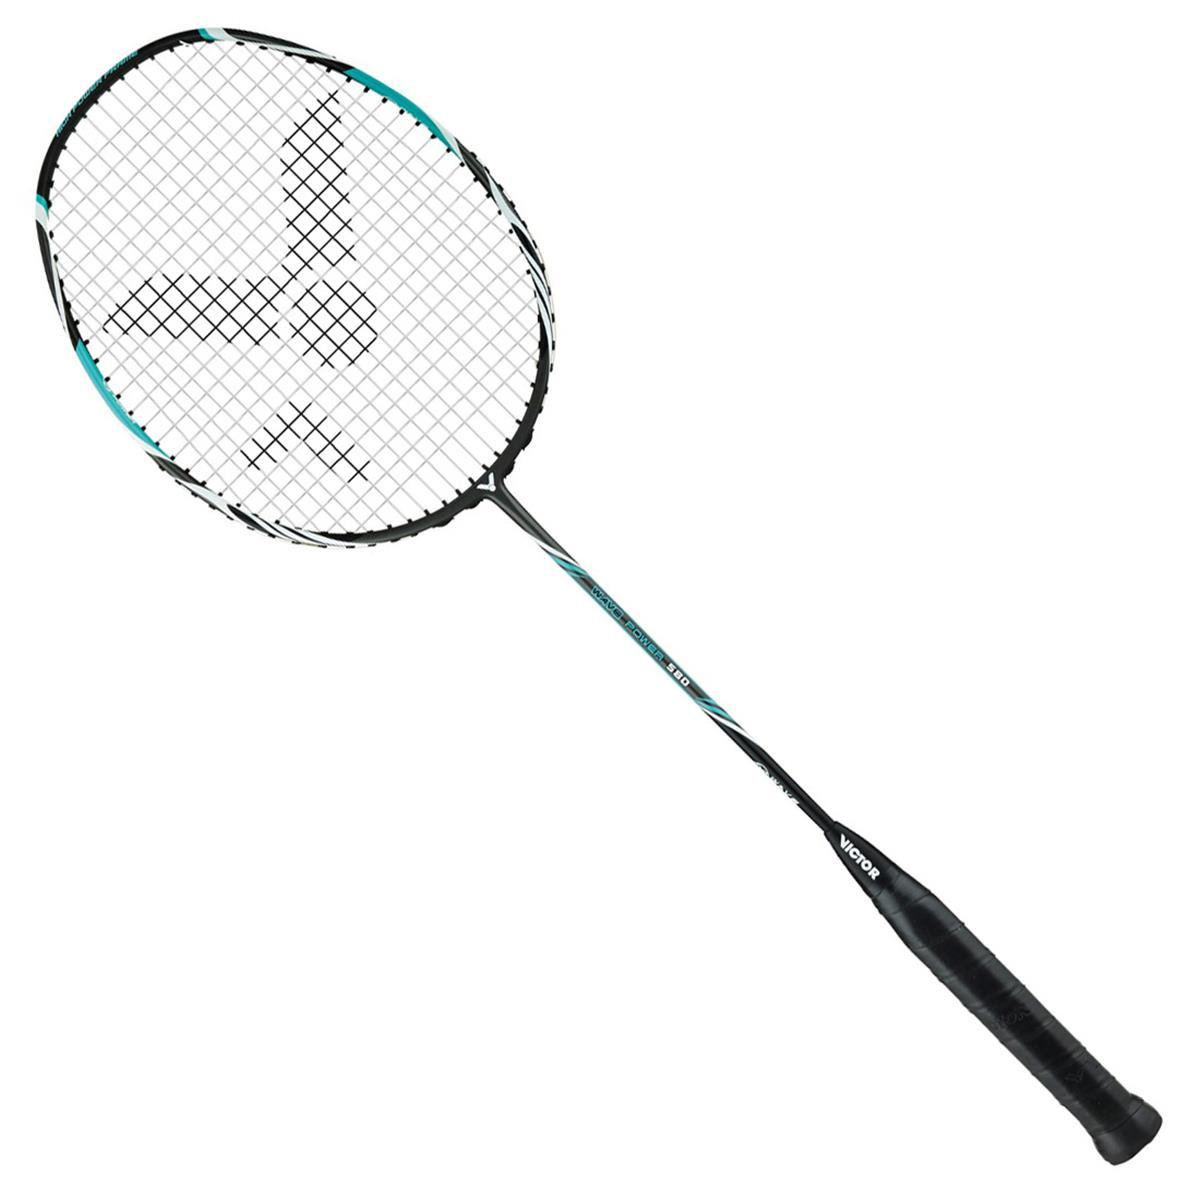 Victor Wave Power 580 Badminton Racket